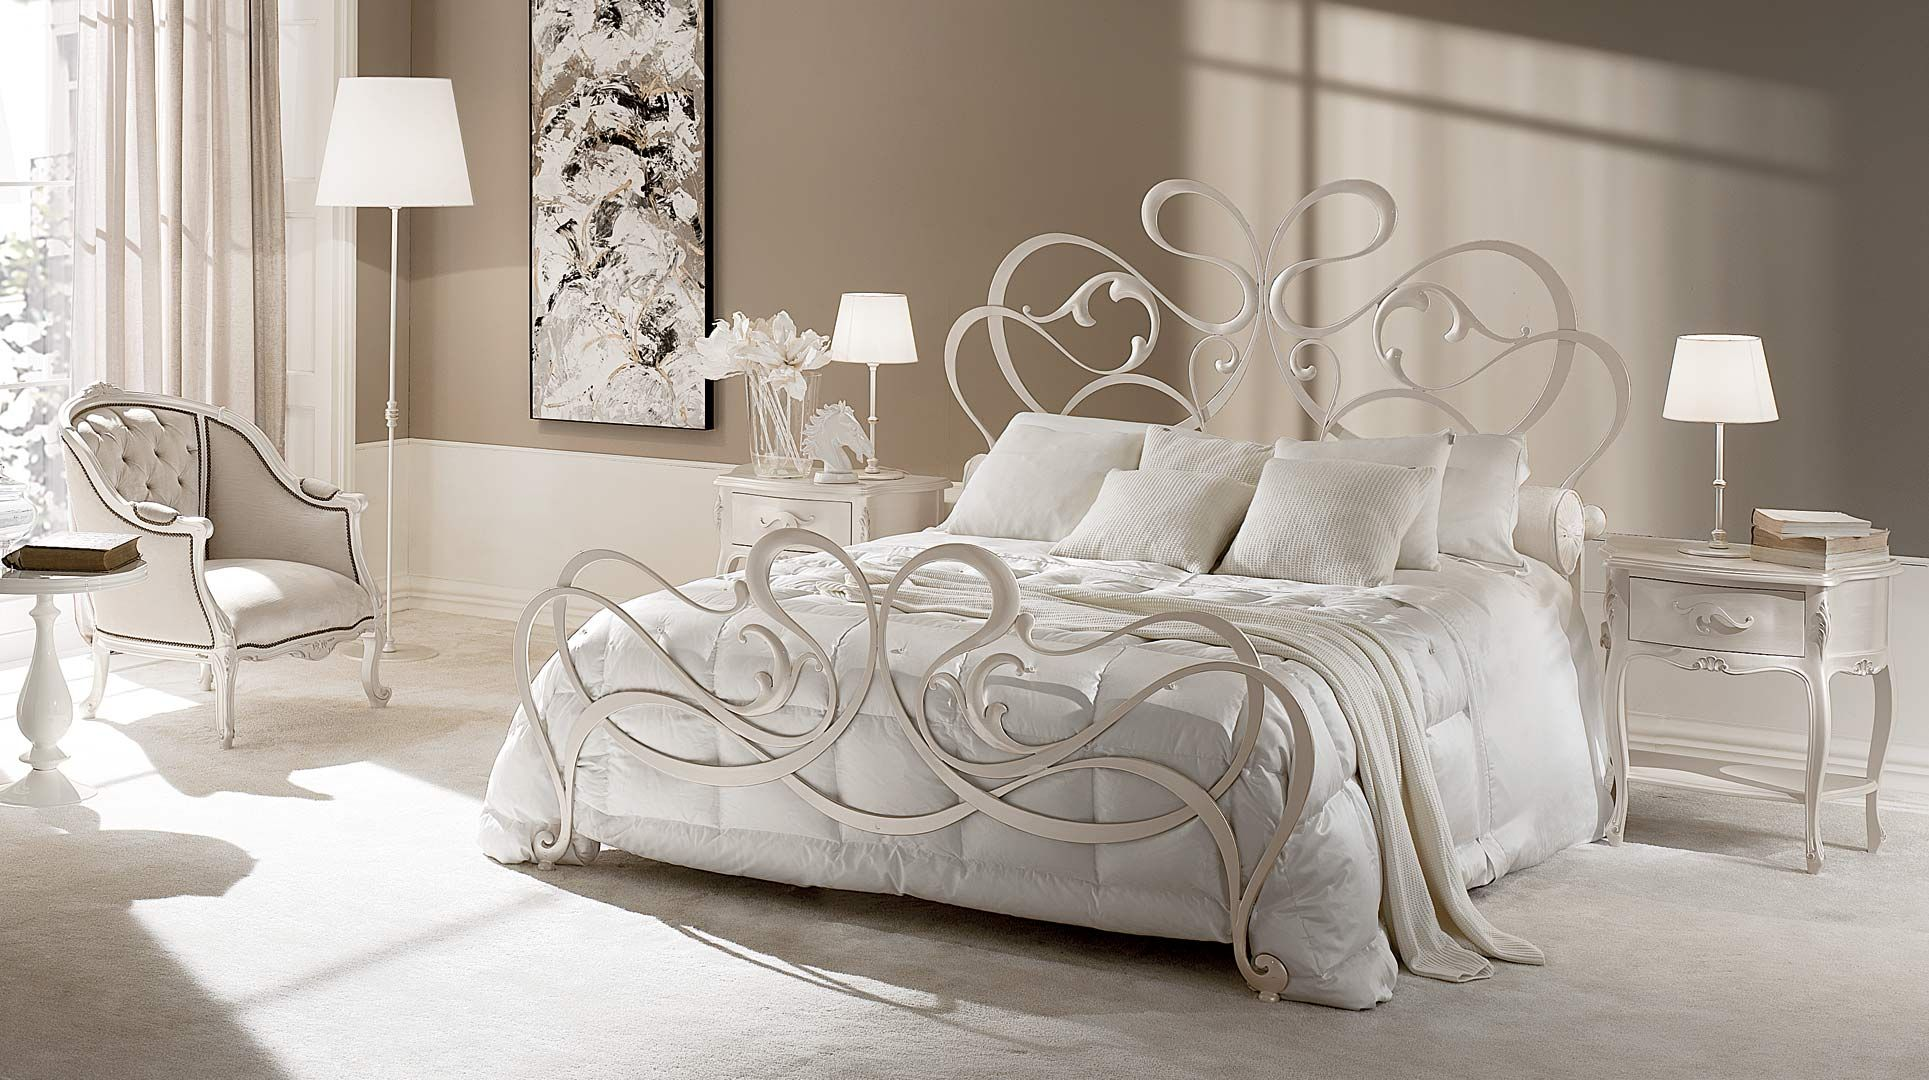 bedroom - Cantori | ferro battuto | Pinterest | Ferro battuto ...